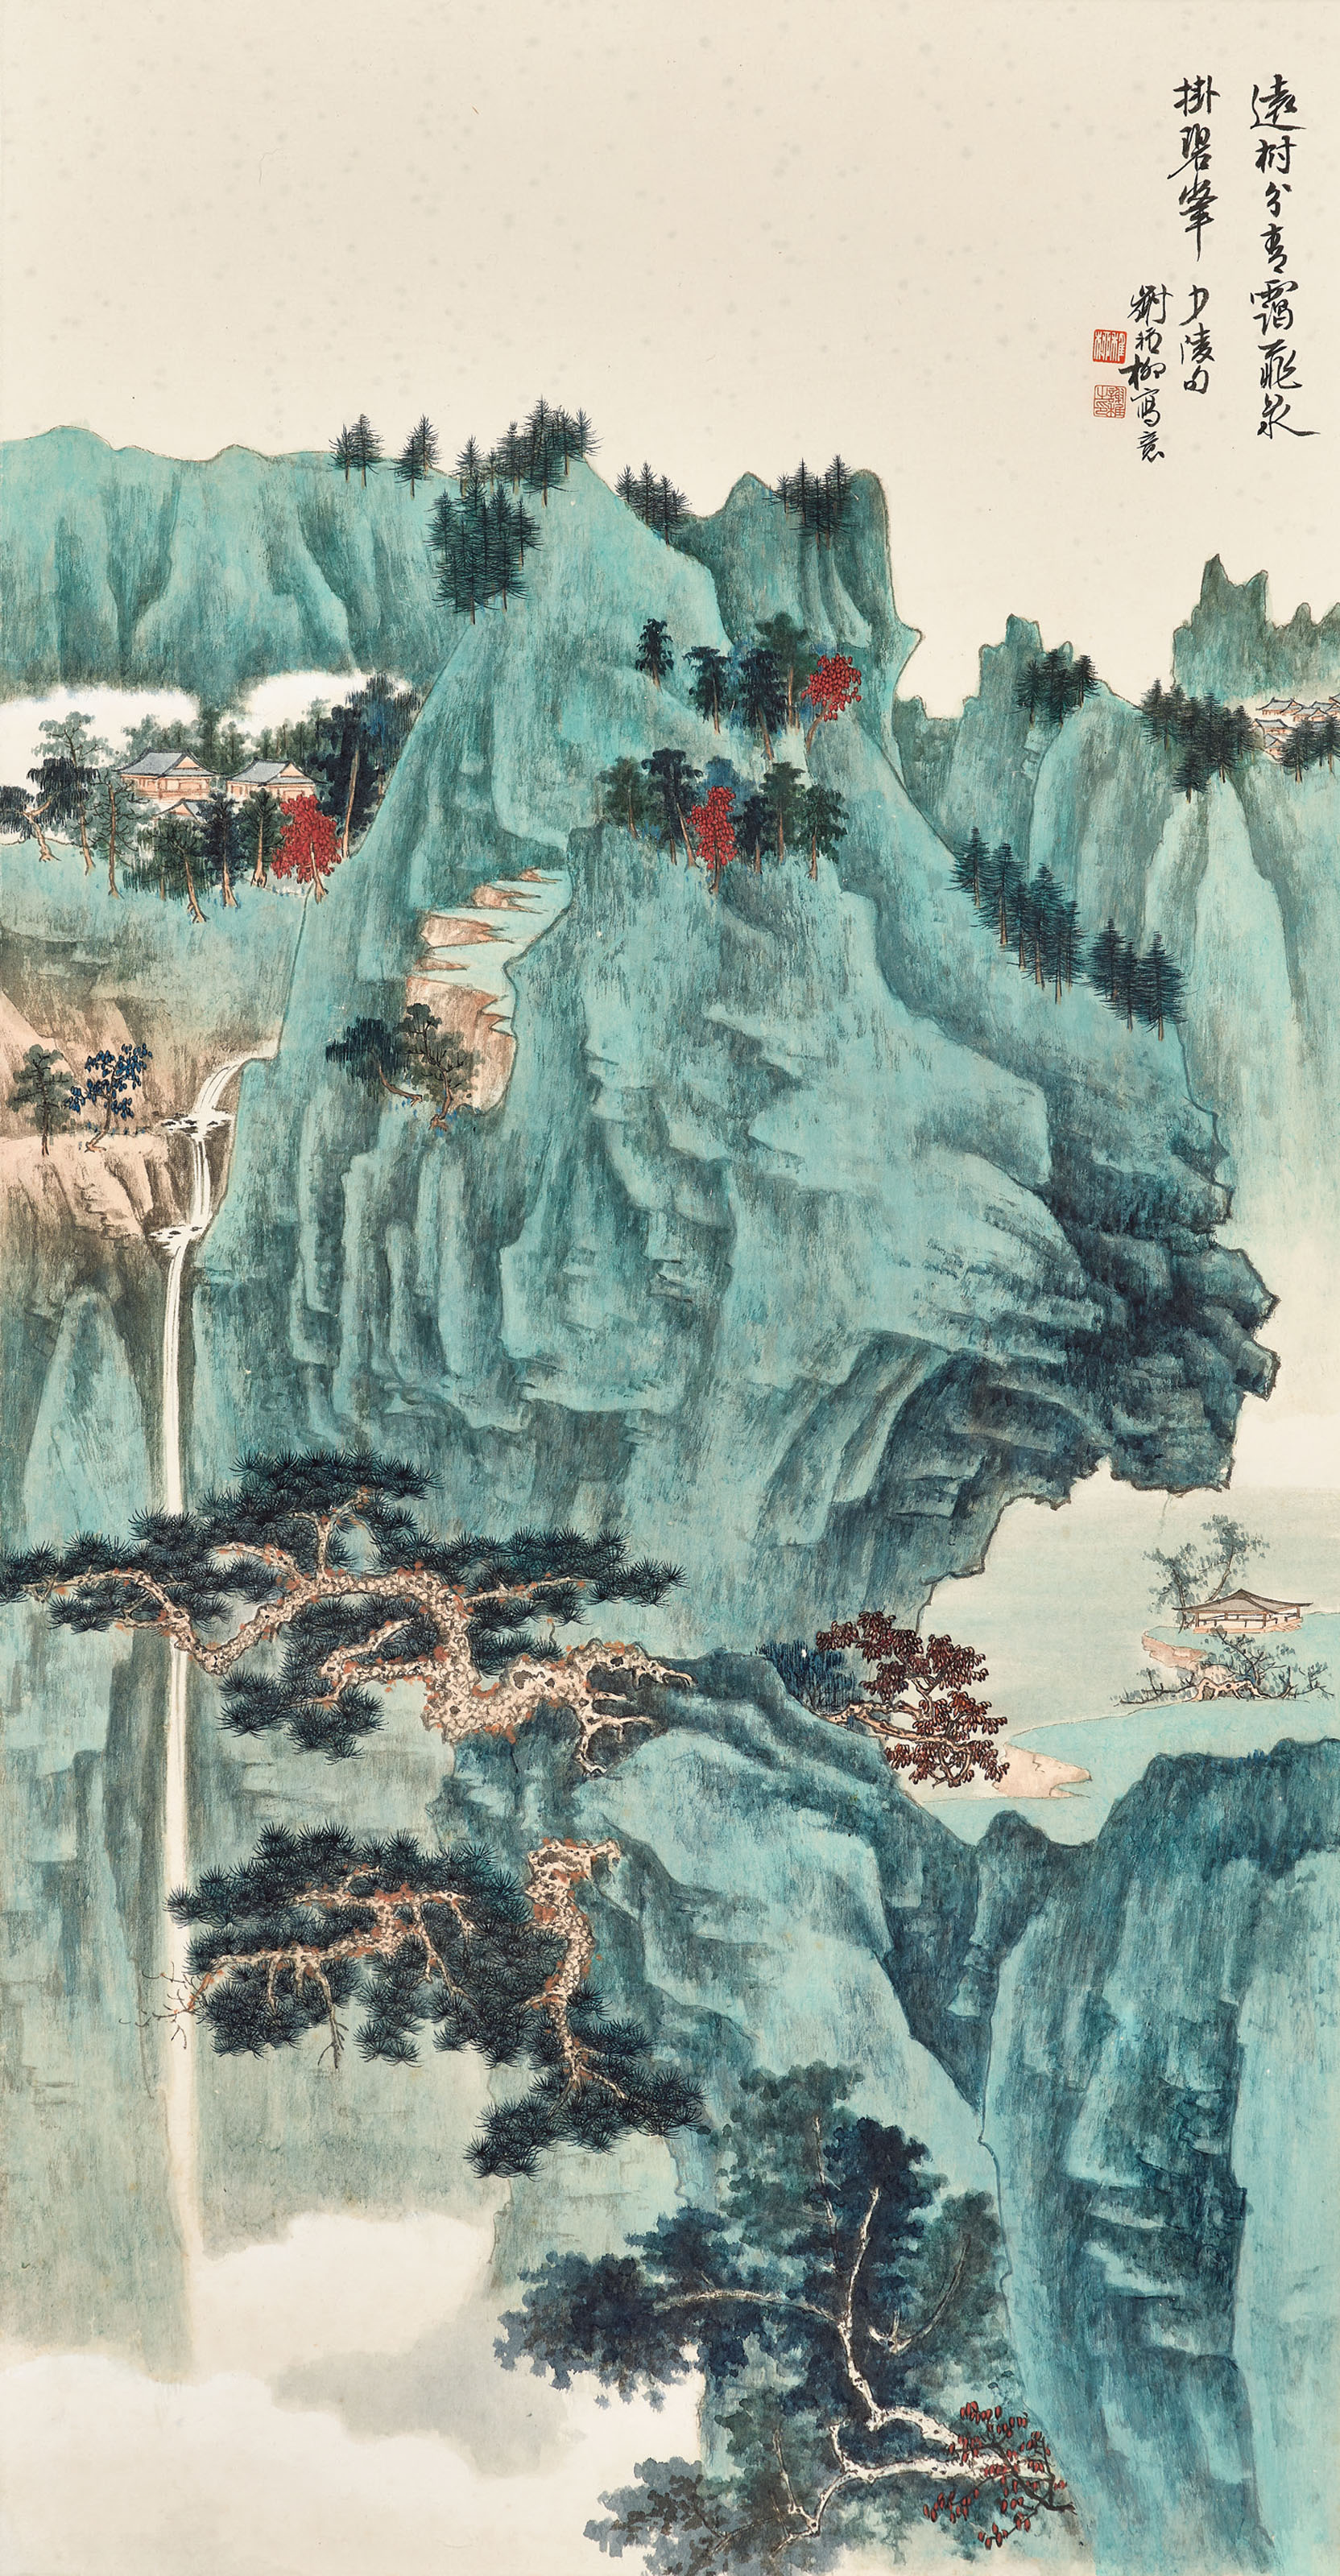 Green Mountain and Waterfall